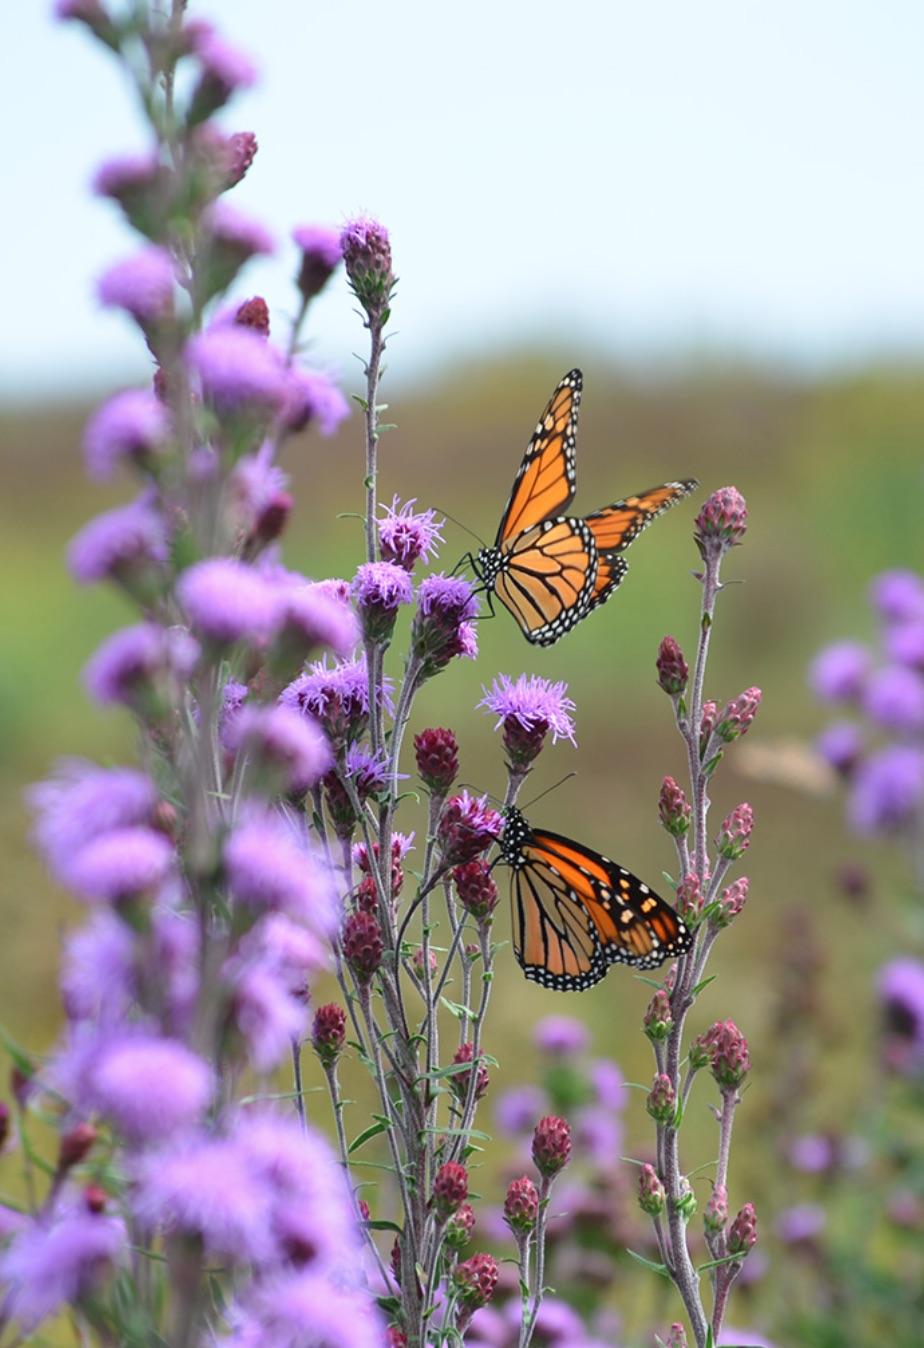 Native Plants Liatris ligulistylis or Meadow Blazing Star #MonarchButterflies #Butterflies #SavetheMonarchs #Gardening #Plants #GardenPollinators #AttractMonarchButterflies #NectarRichPlants #BeneficialForPollinators